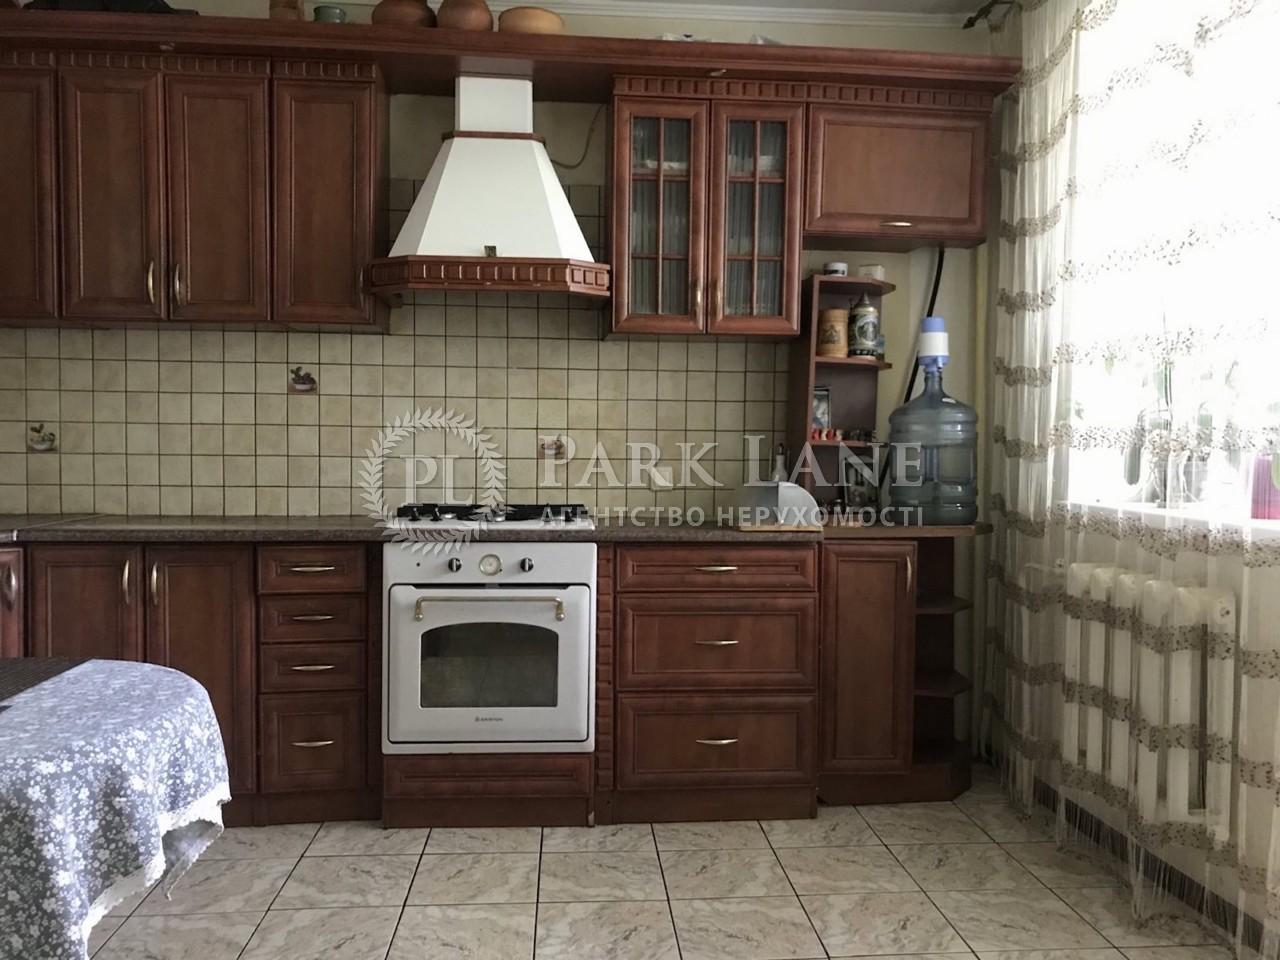 Квартира ул. Ломоносова, 34/1а, Киев, R-34152 - Фото 8